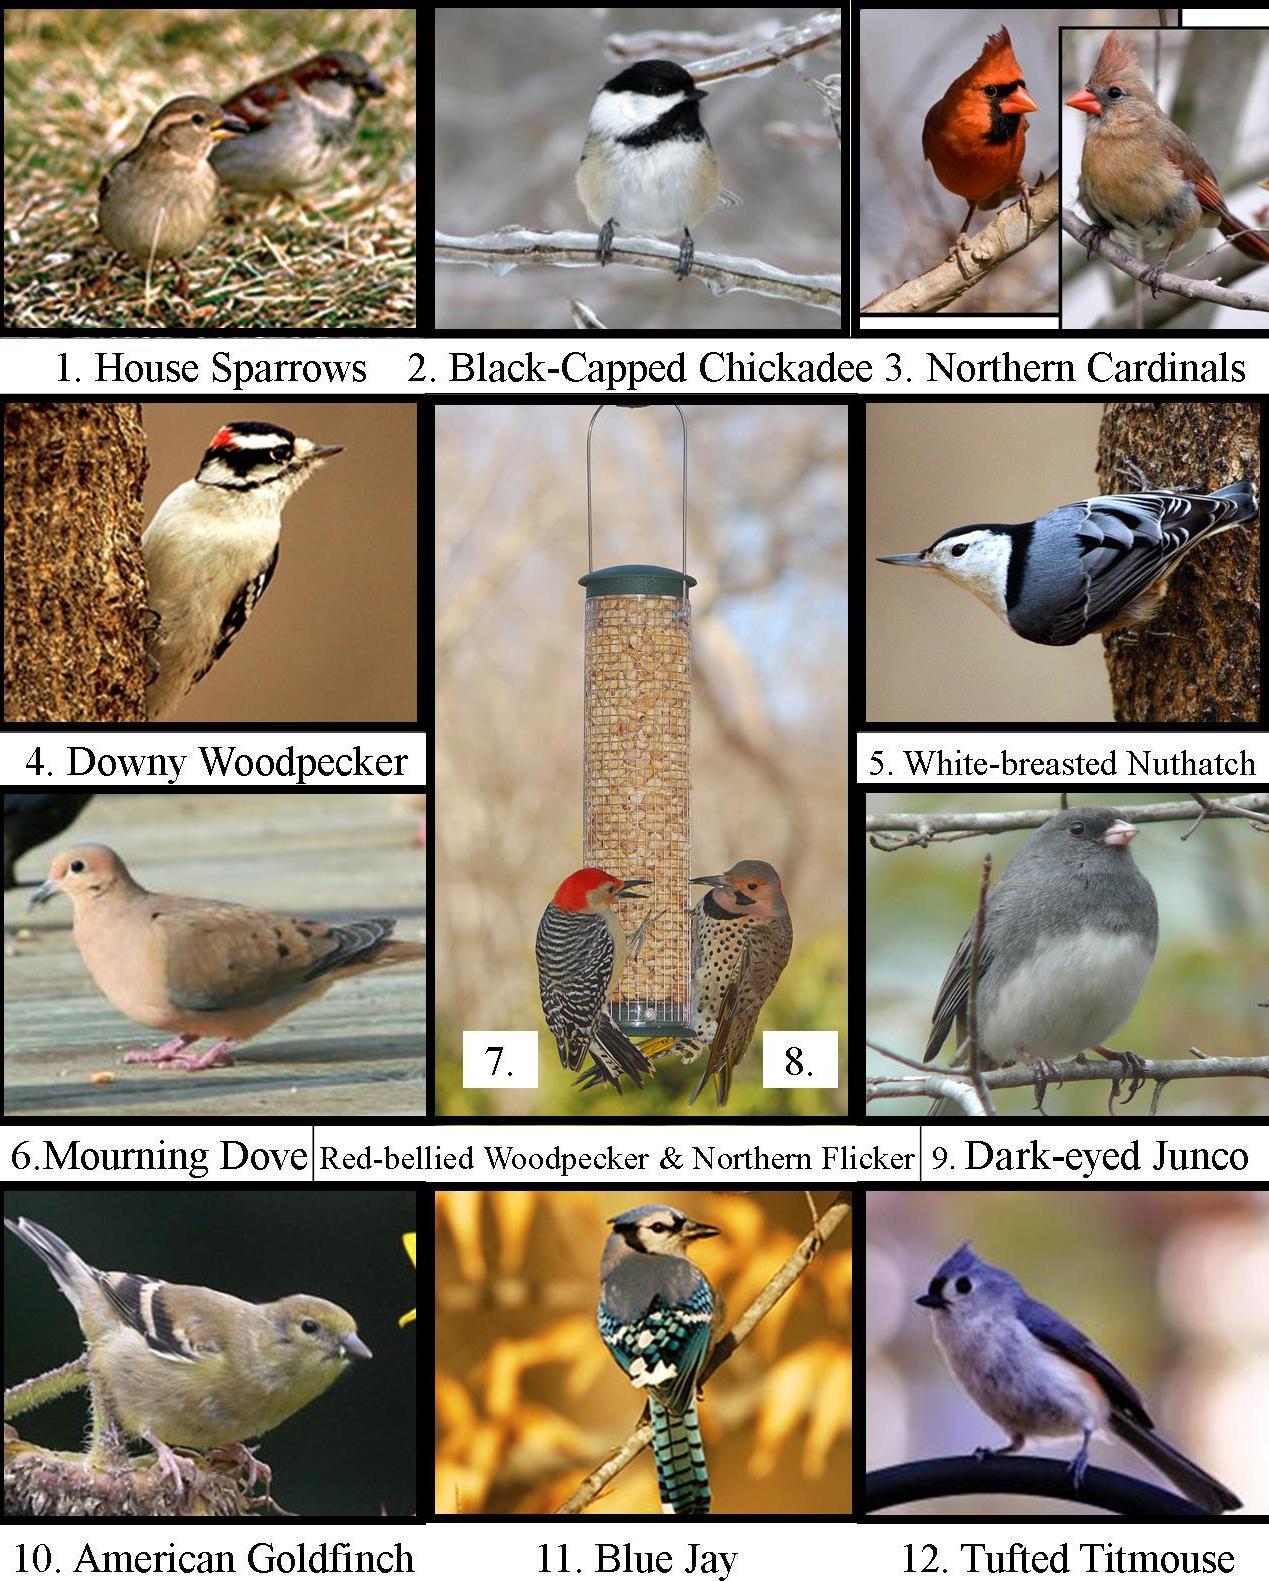 Wild Birds Unlimited: Michigan's Top 20 Winter Backyard Birds